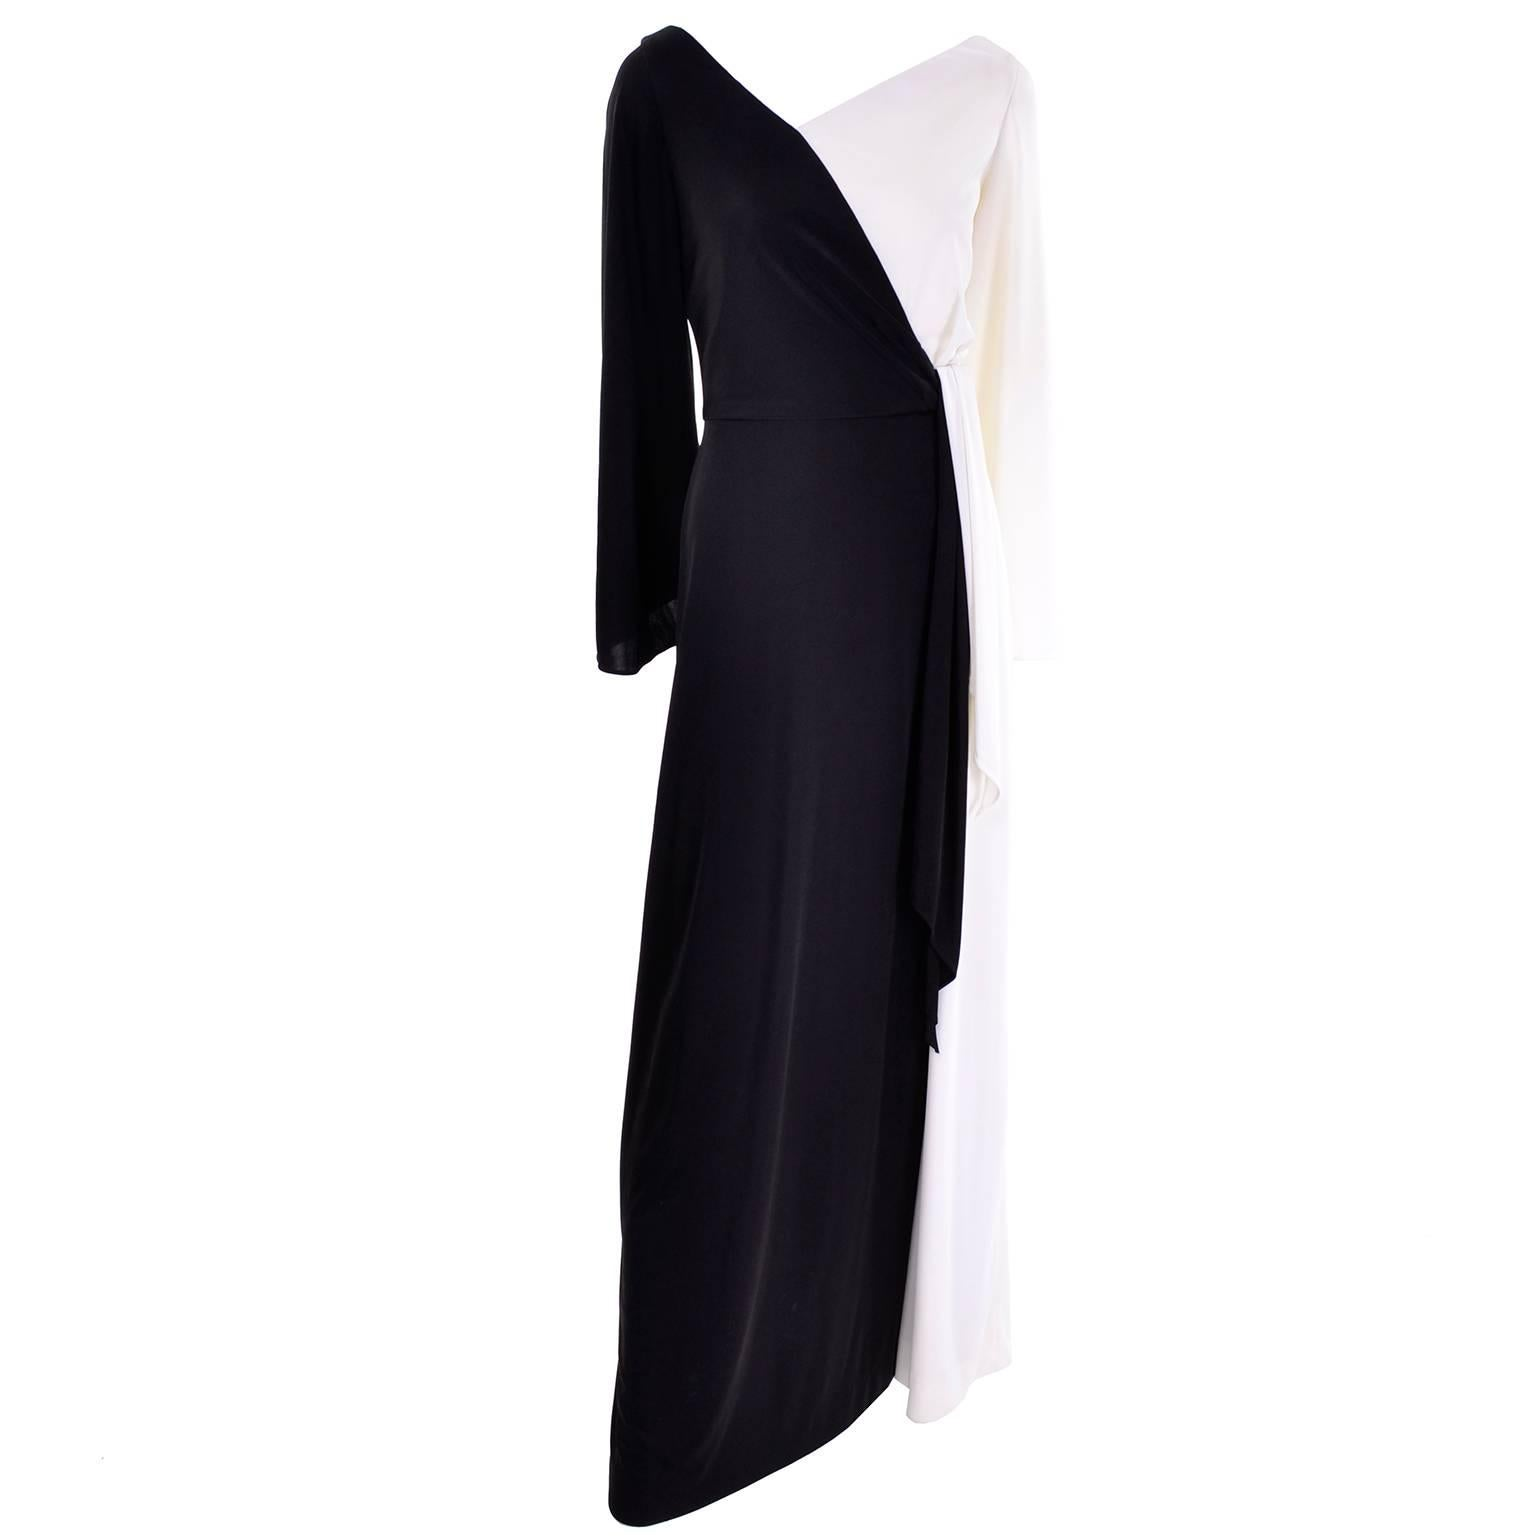 Estevez Vintage Black and White Jersey Dress New With Original Tags